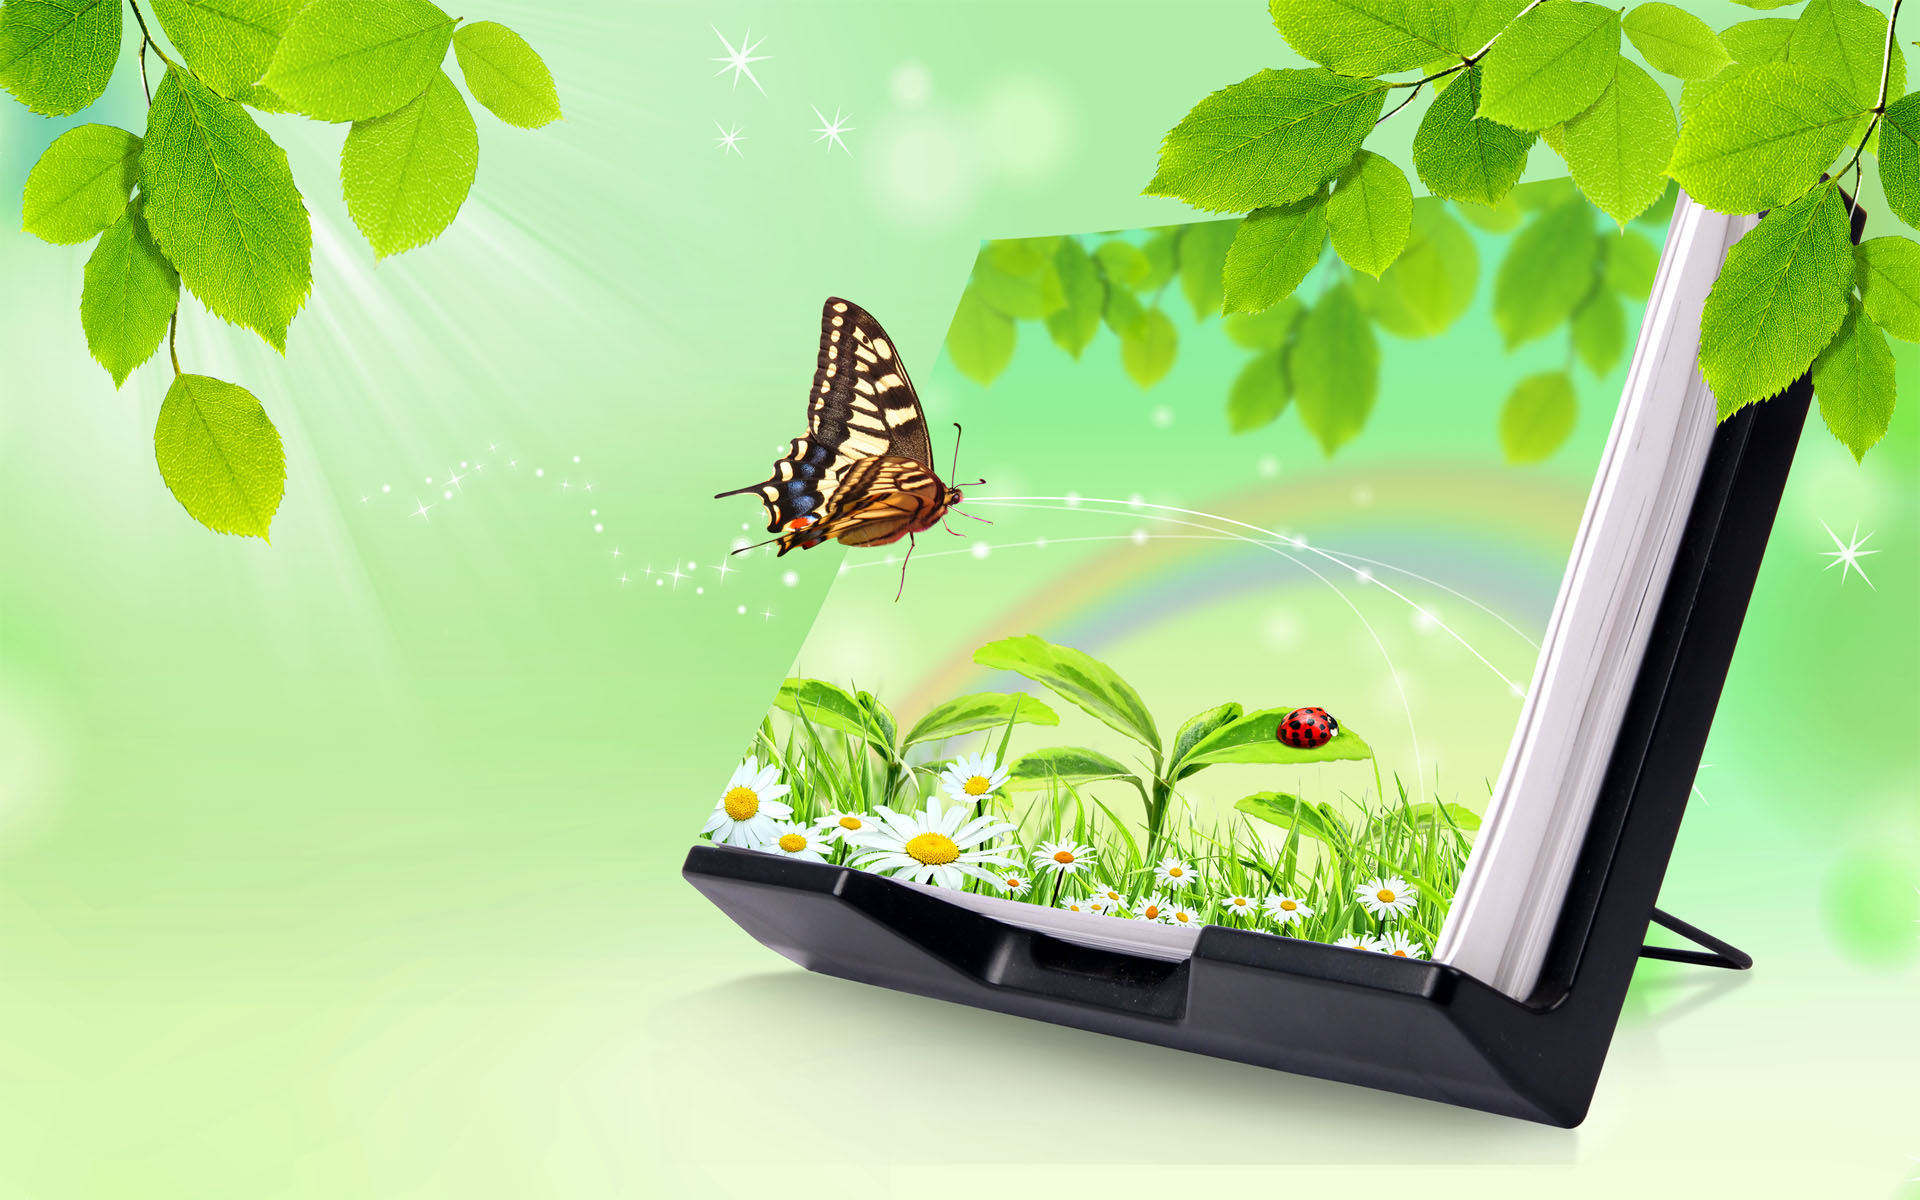 Latest Desktop Wallpapers Hd Free Download 1920x1200